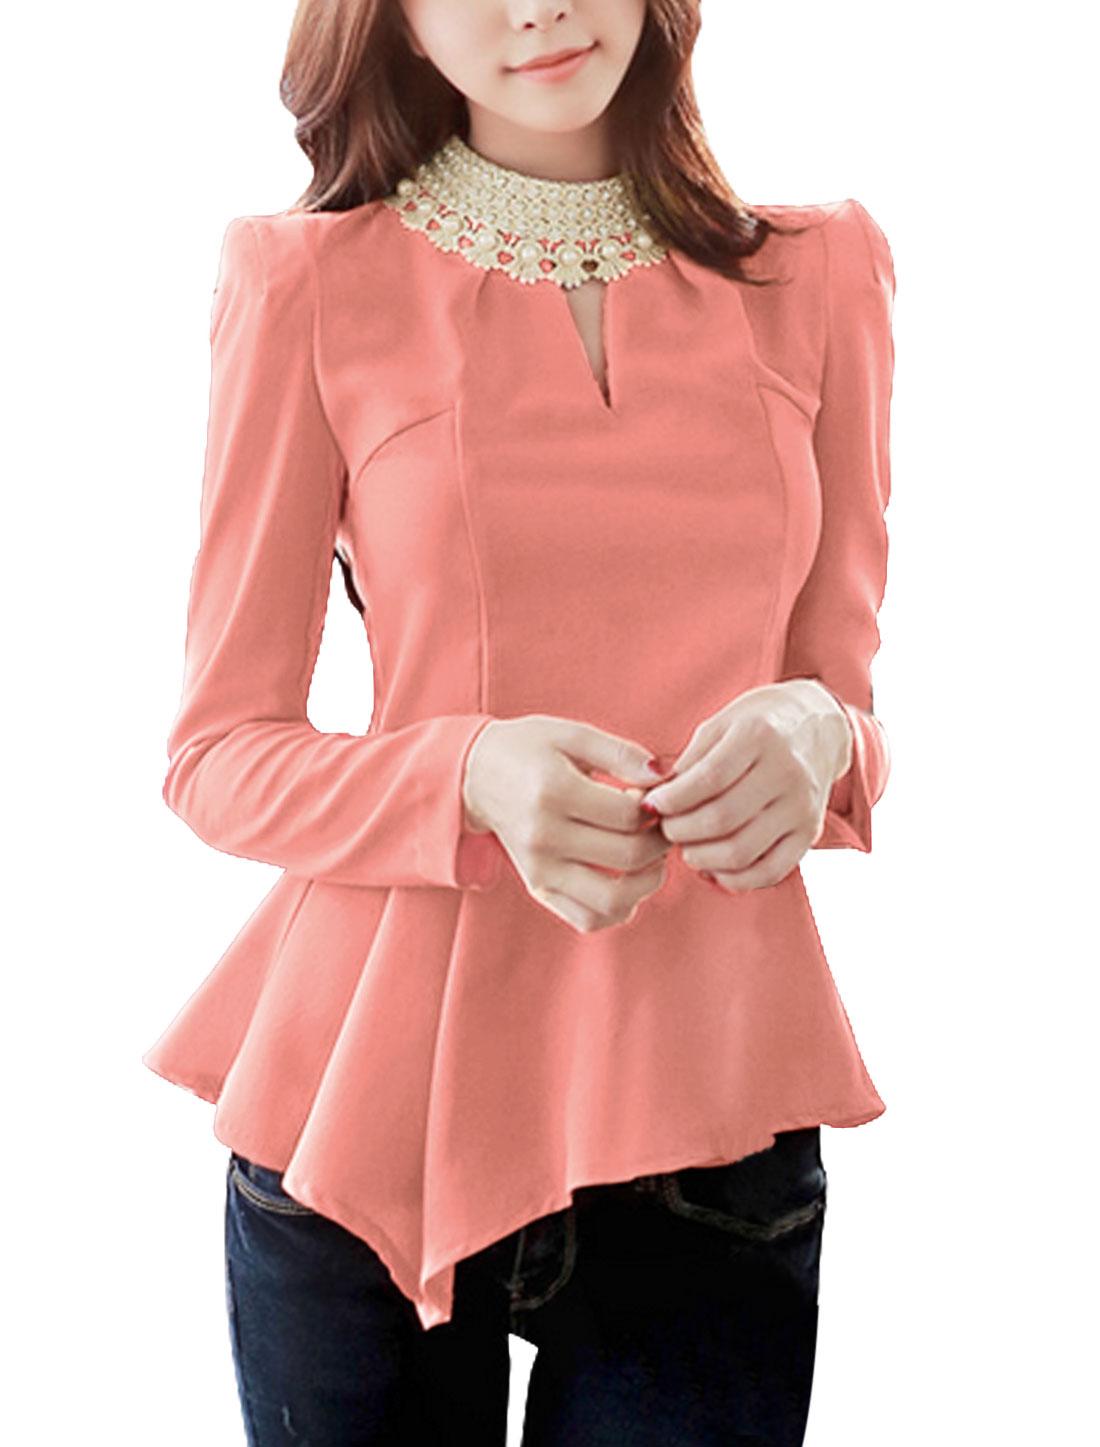 Ladies Pullover Long Sleeved Asymmetric Hem Pink Peplum Top XS